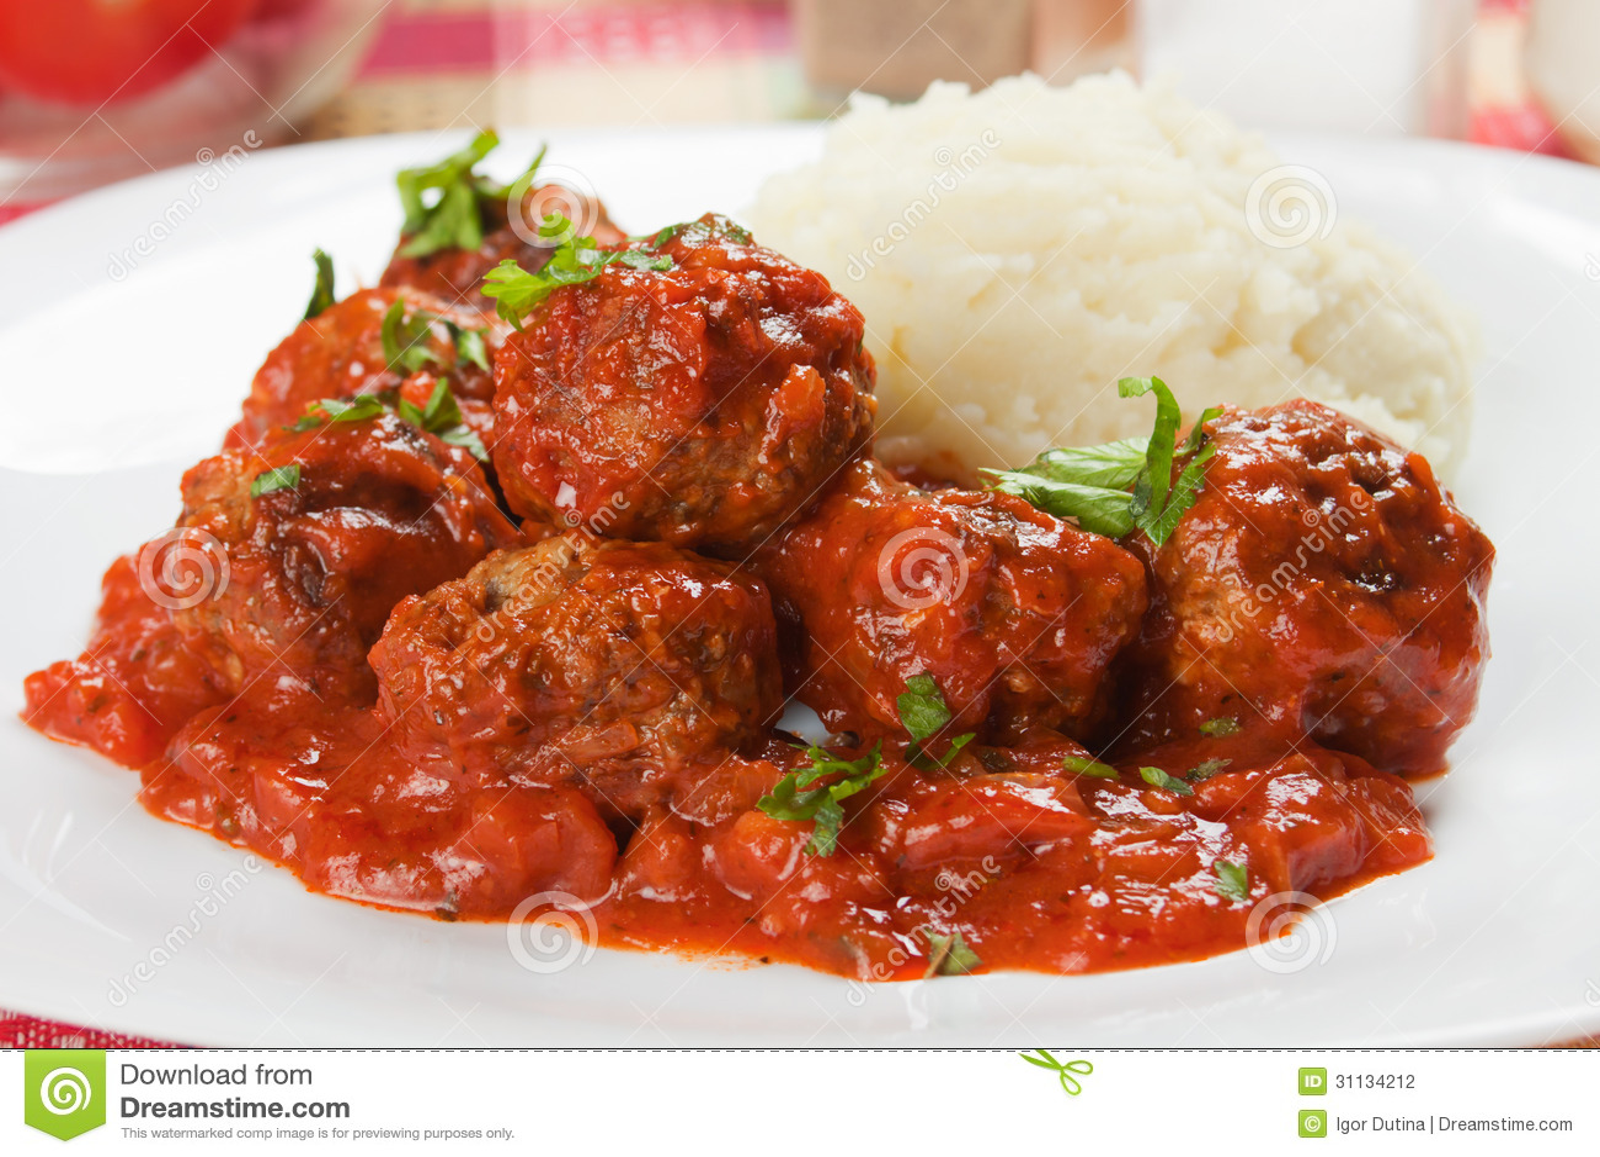 Meat balls with mashed potatoand tomato sauce.